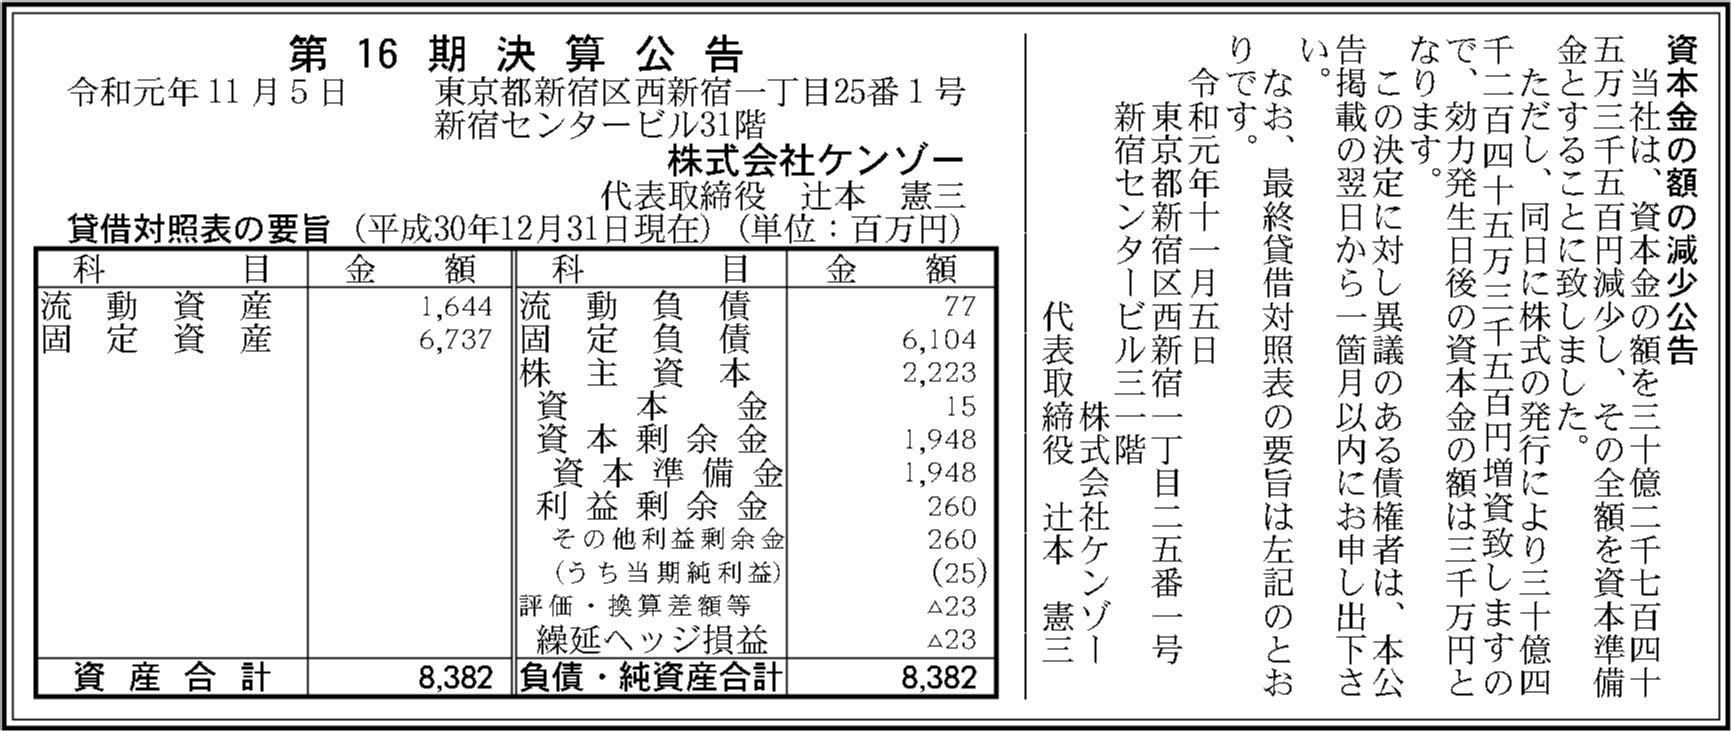 0093 8ada2cd4f4f448feb8356a4e64f9103e8644d8520cbfa72924109261538fd5f89558bdf19bc16e0b768b585419bda3c268f5cf28607fb2cf8cc4f60a98514b9b 03